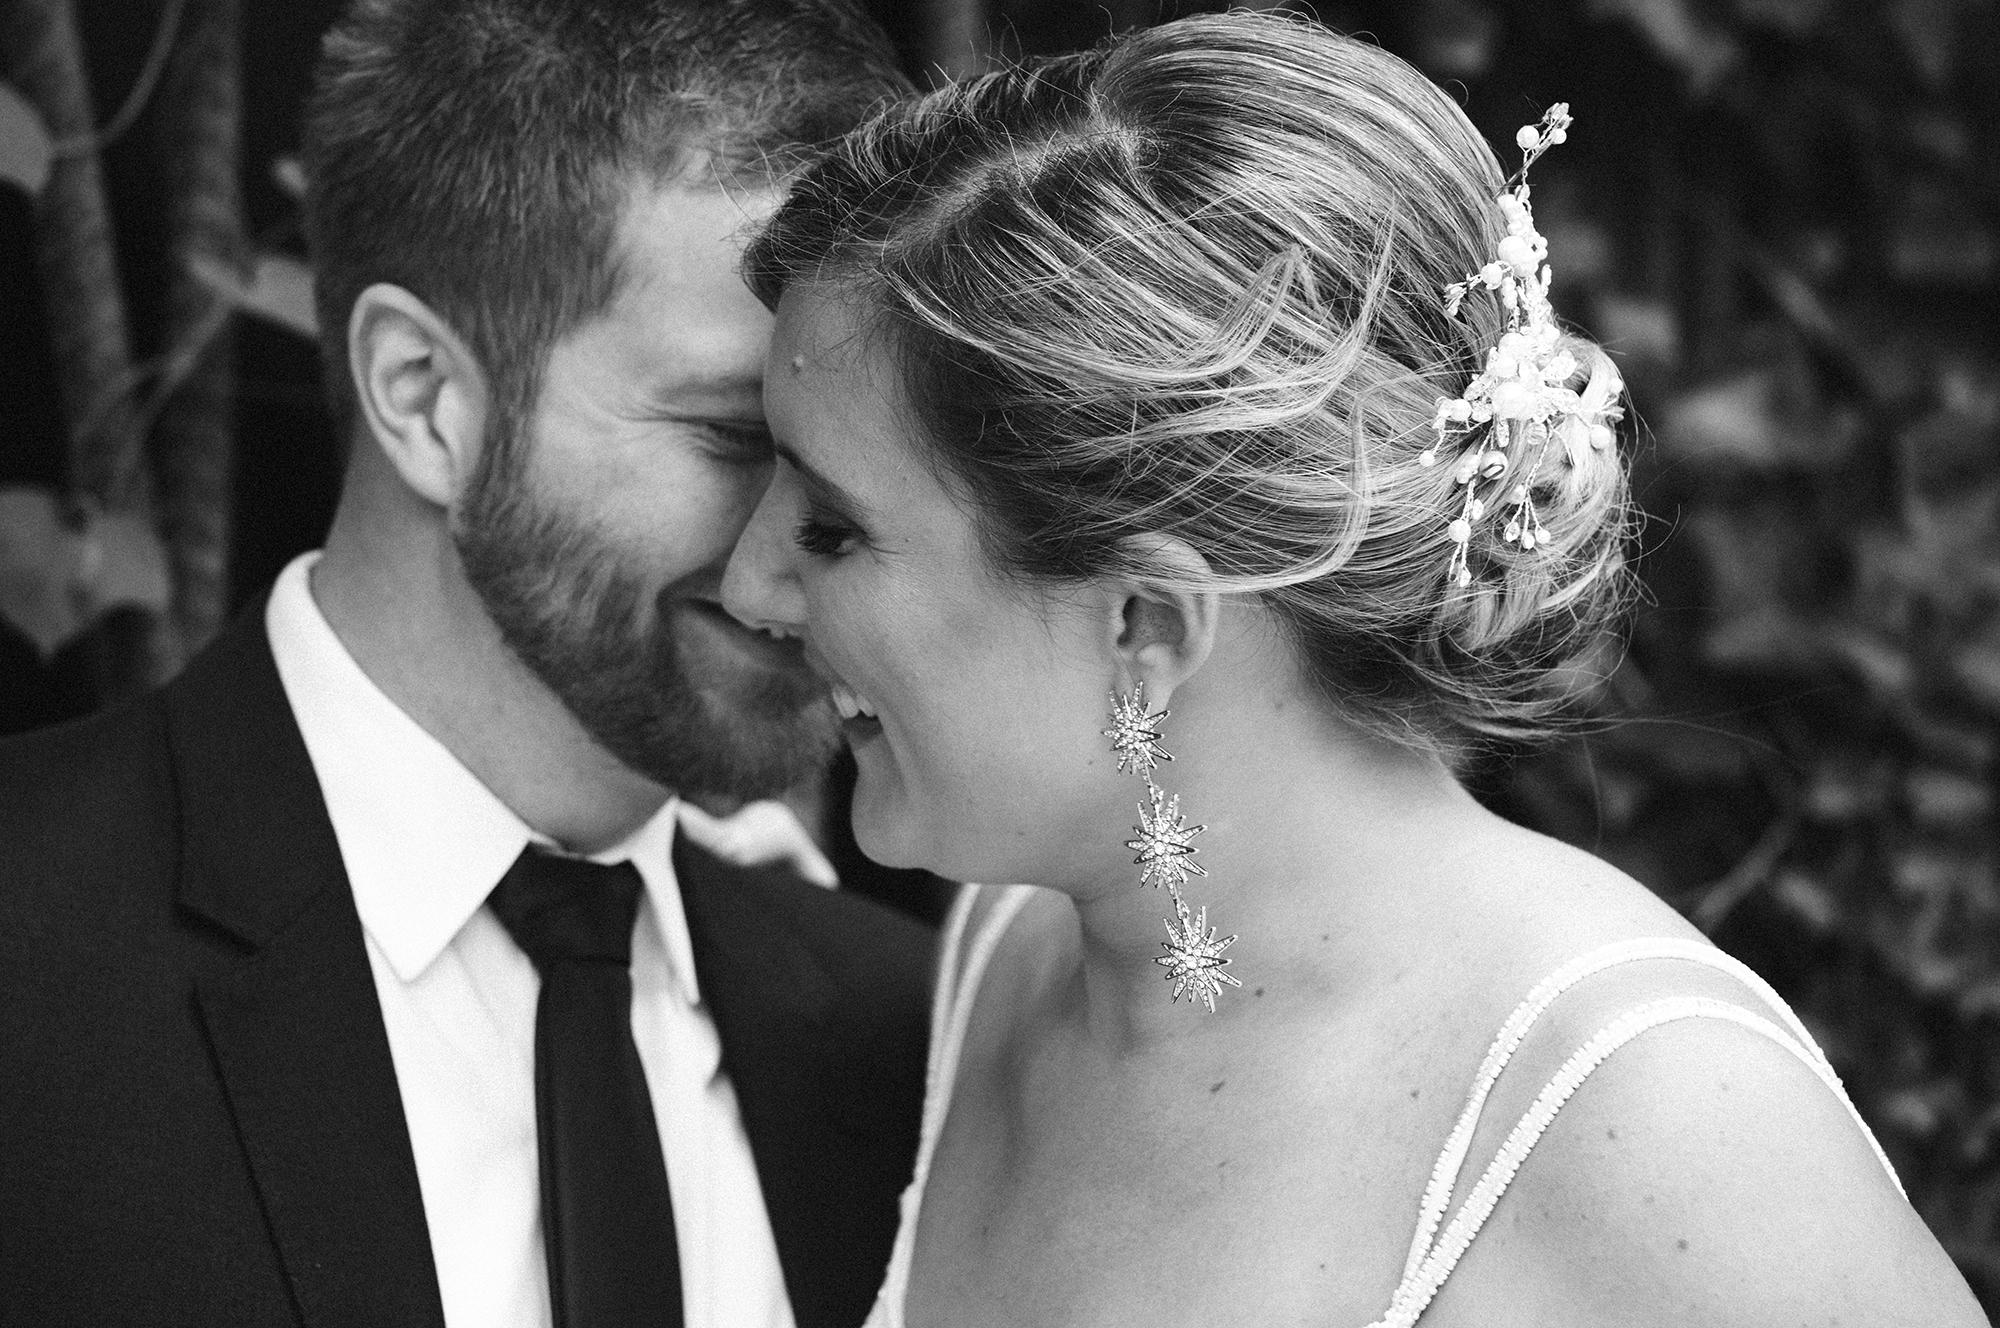 Julep-Belle-Wedding-Photography-Los-Angeles-Grace-Jake-18.jpg